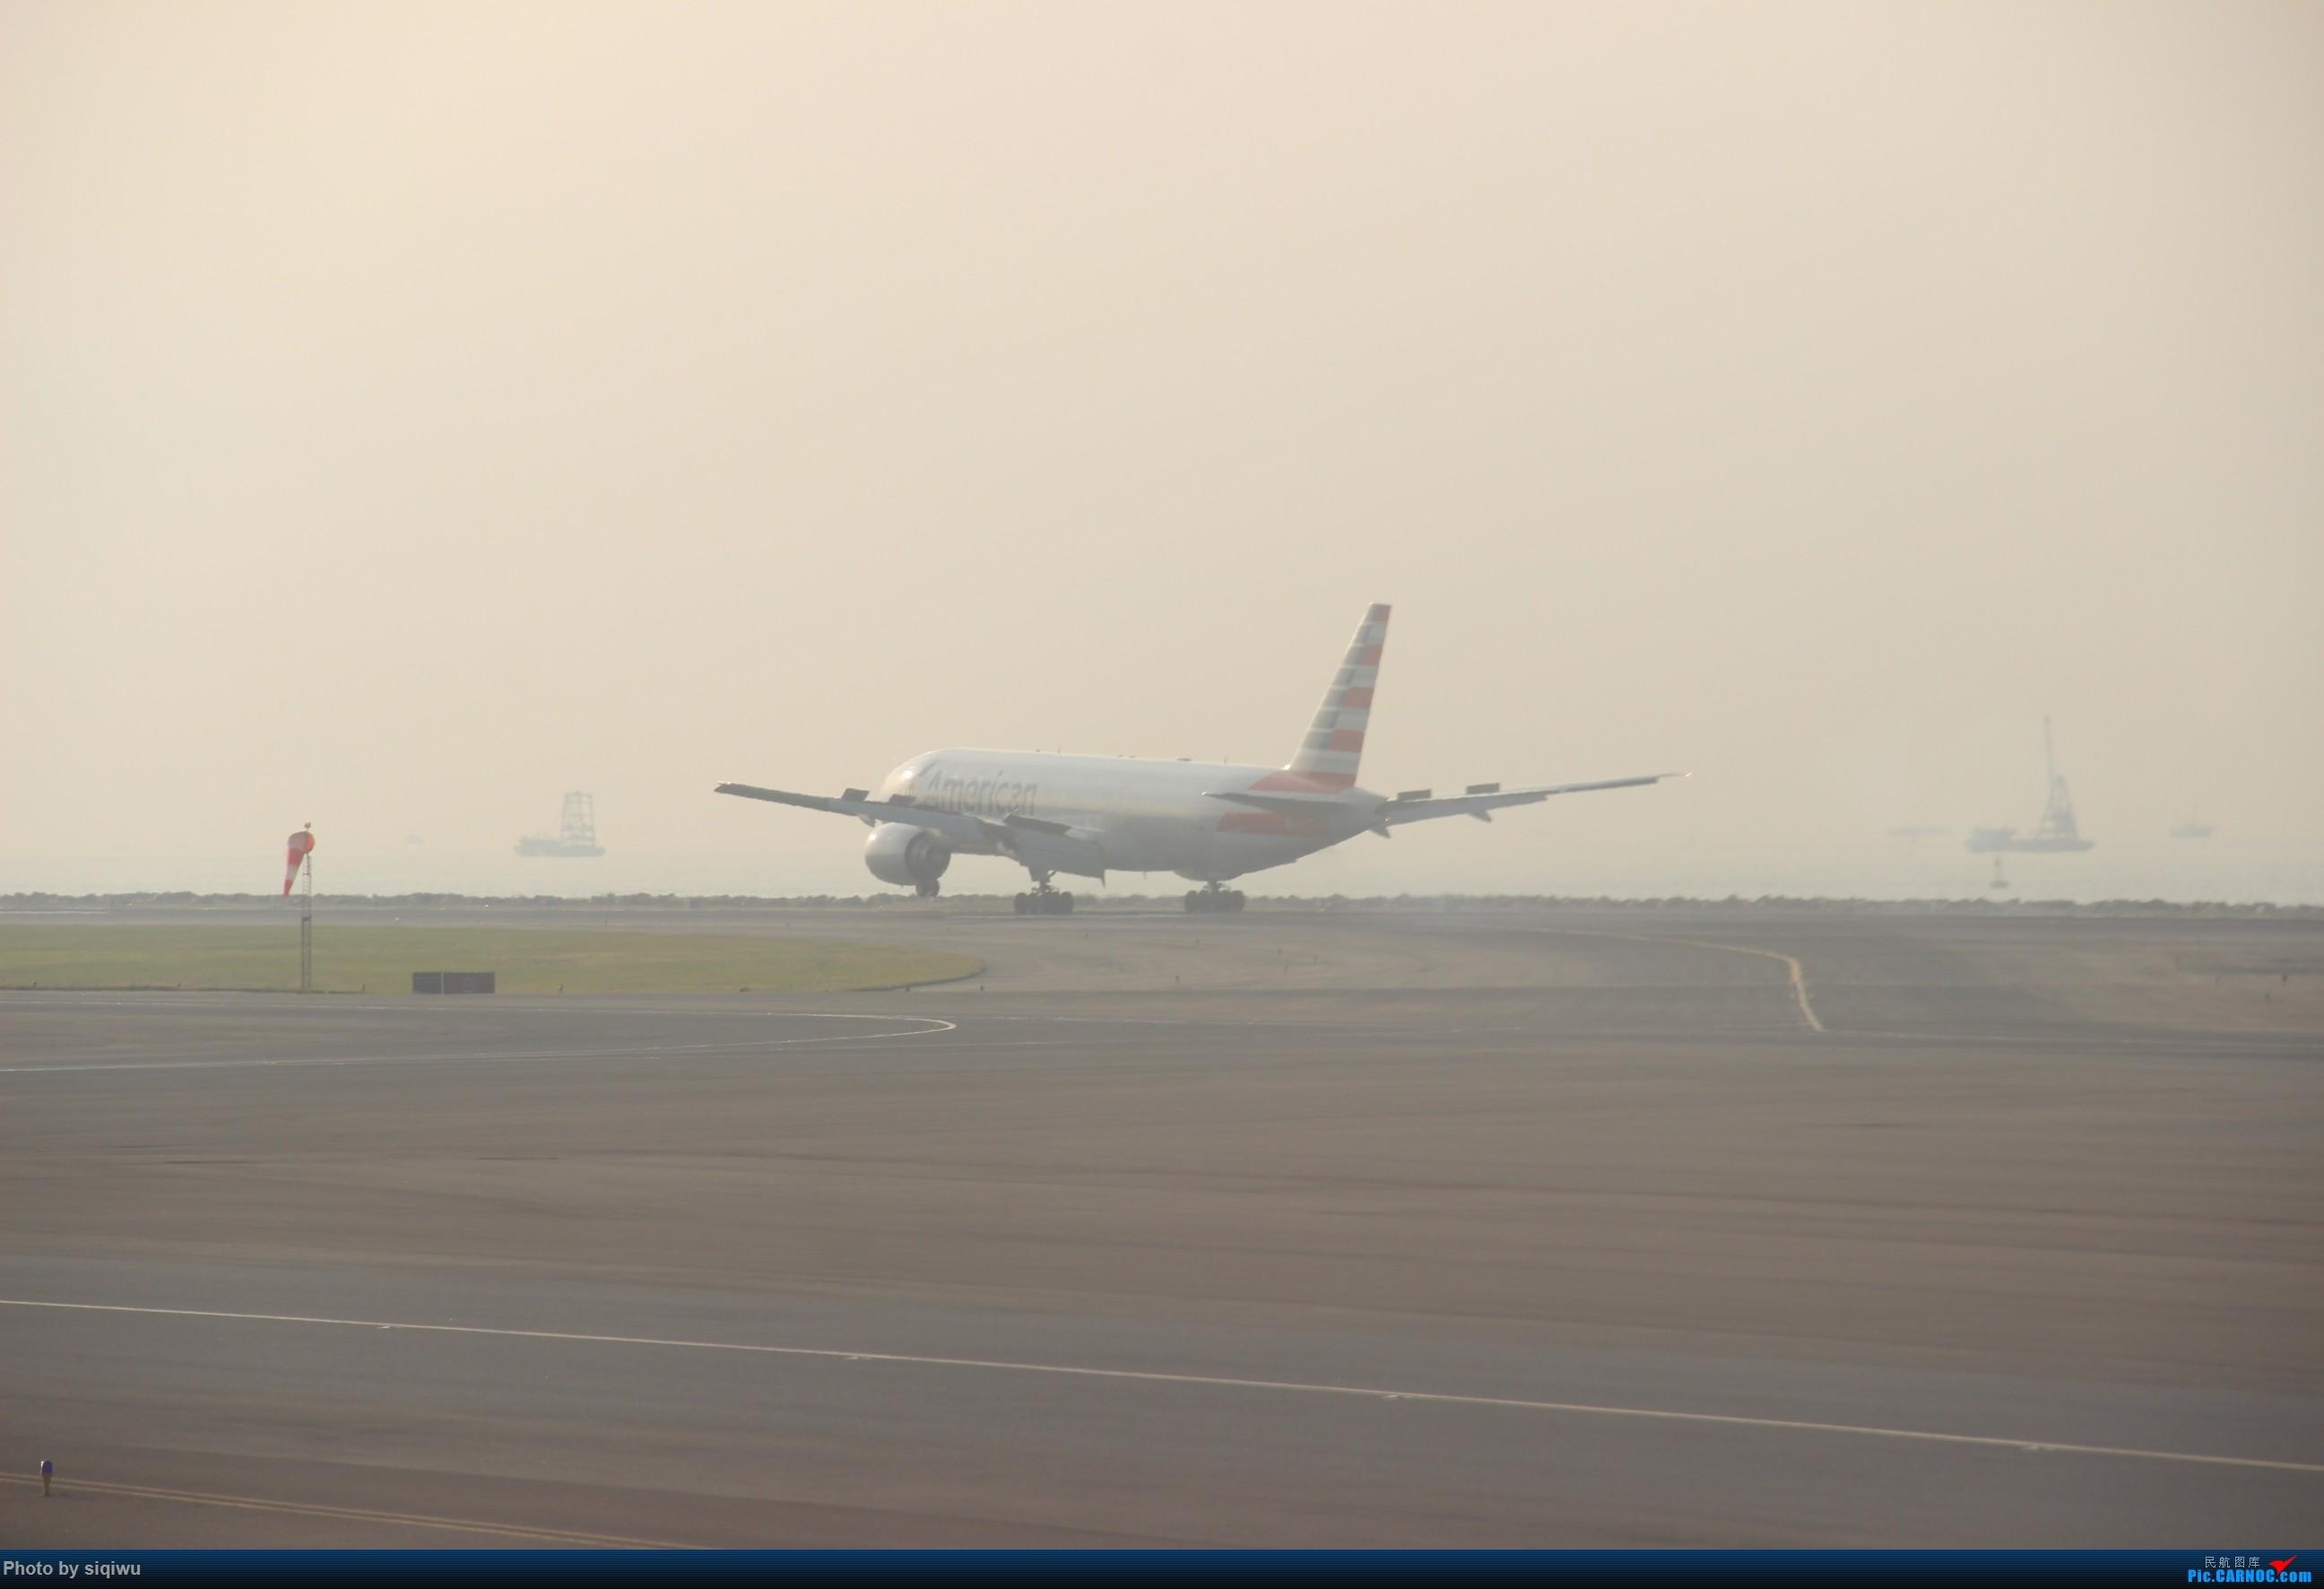 Re:[原创]PVG-HKG-KUL-HKG-PVG 四天往返,CX/KA BOEING 777-200  中国香港国际机场